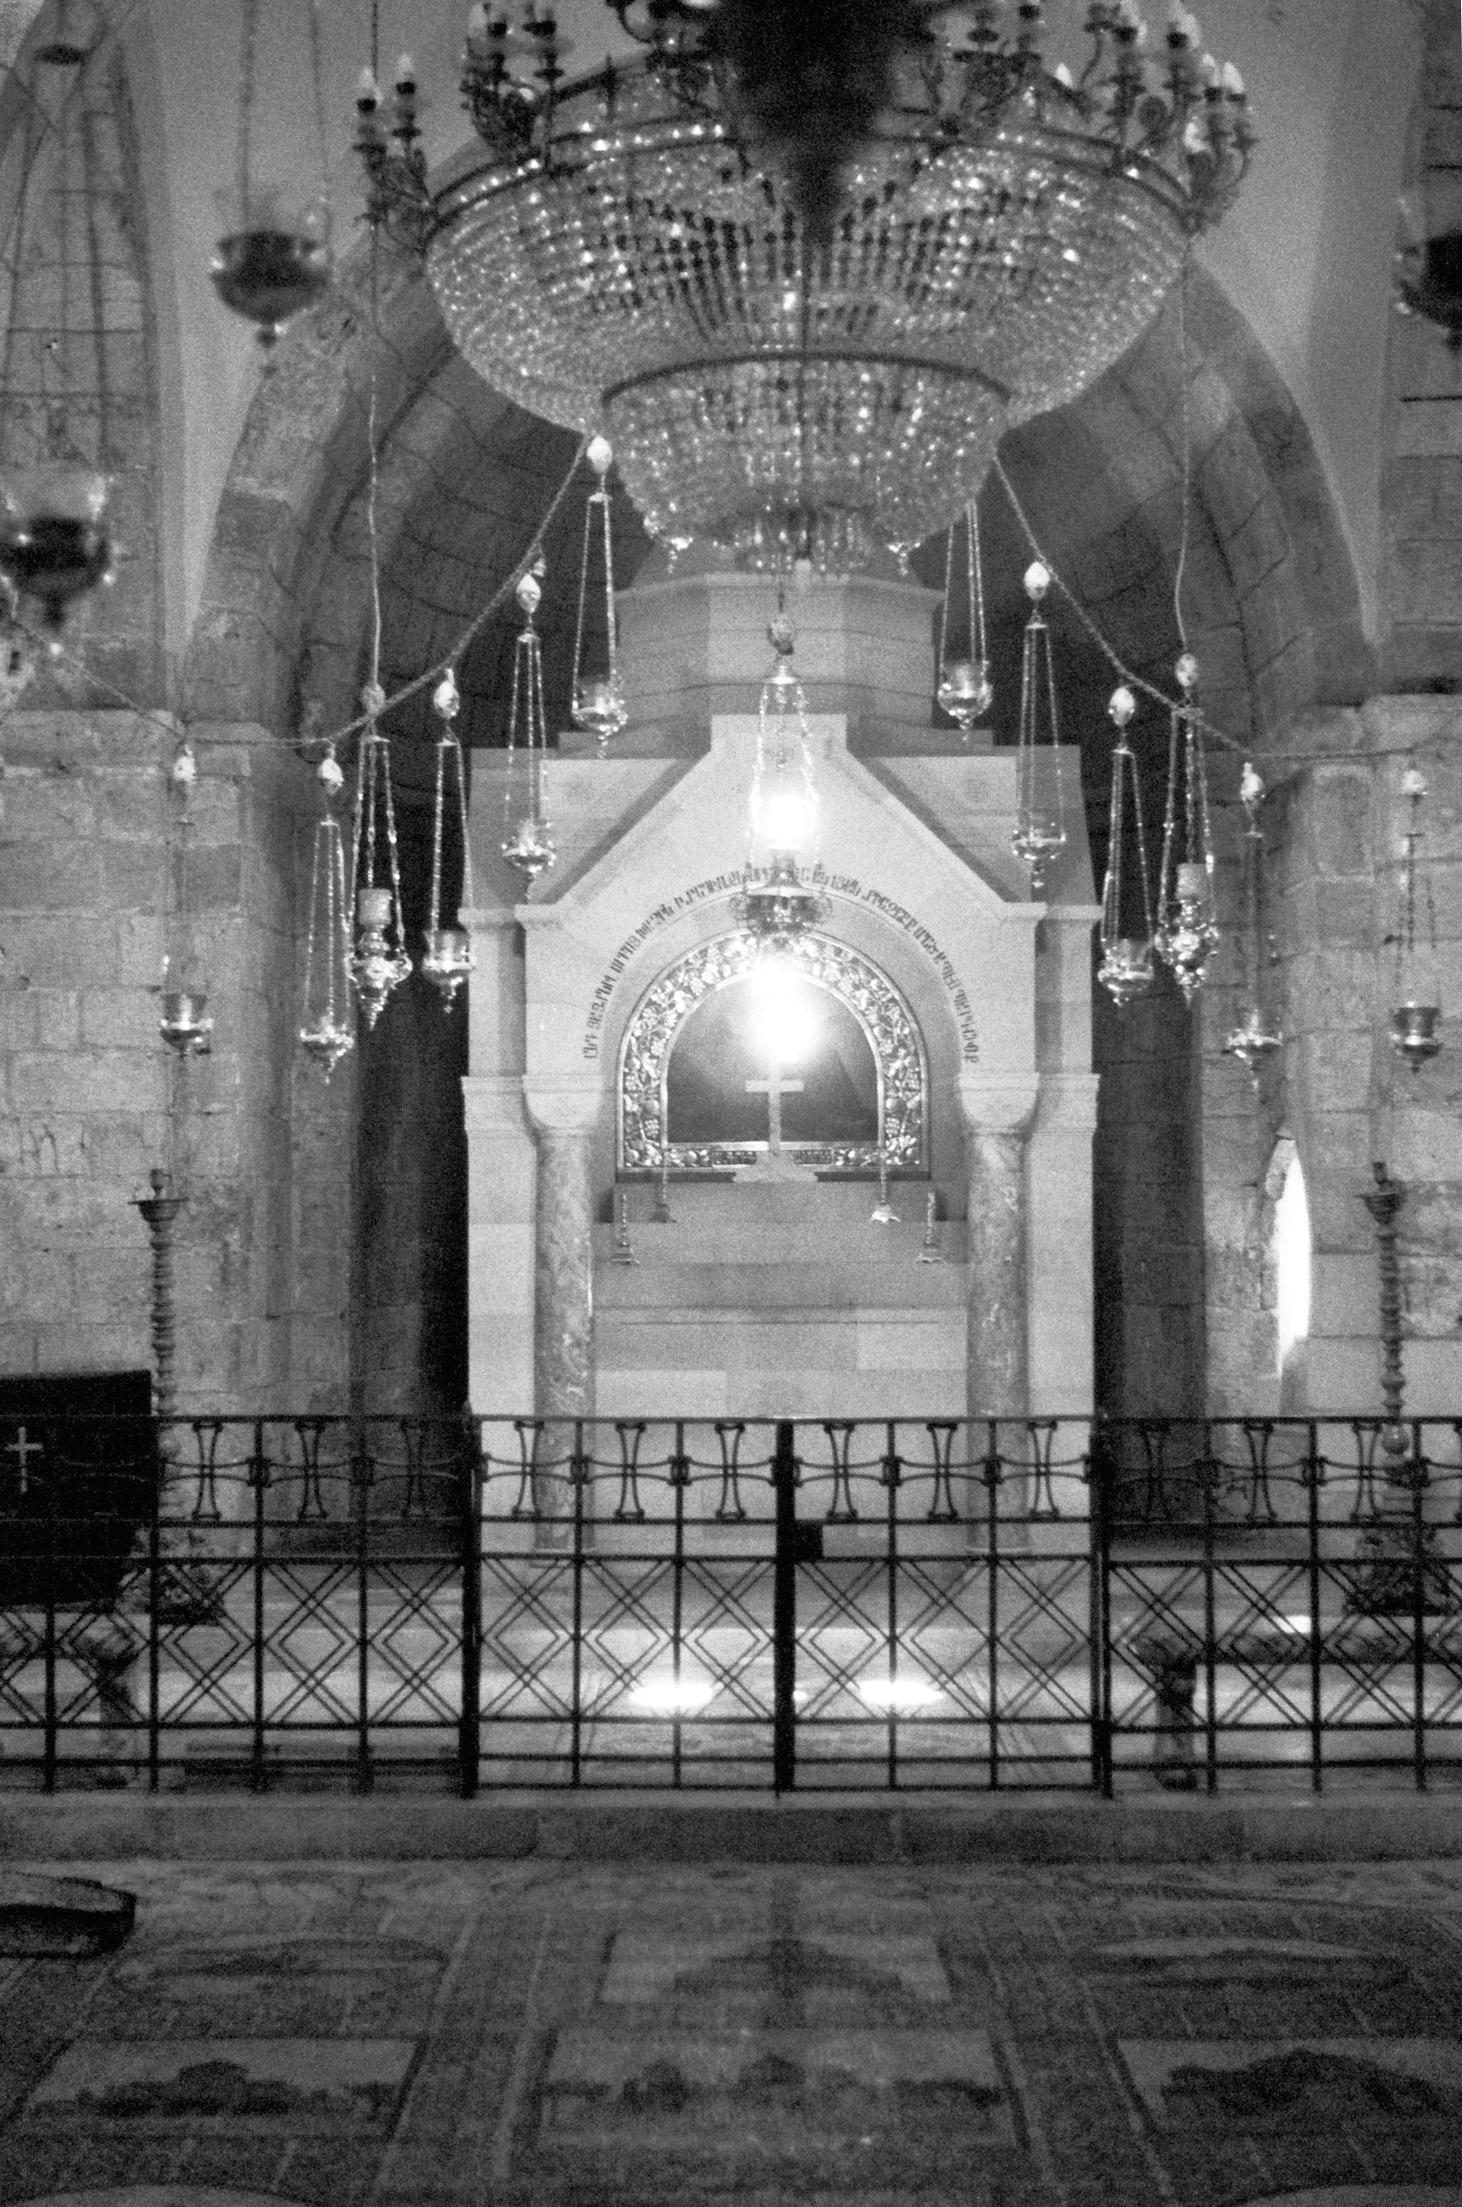 Church of the Holy Sepulchre, Jerusalem 2017